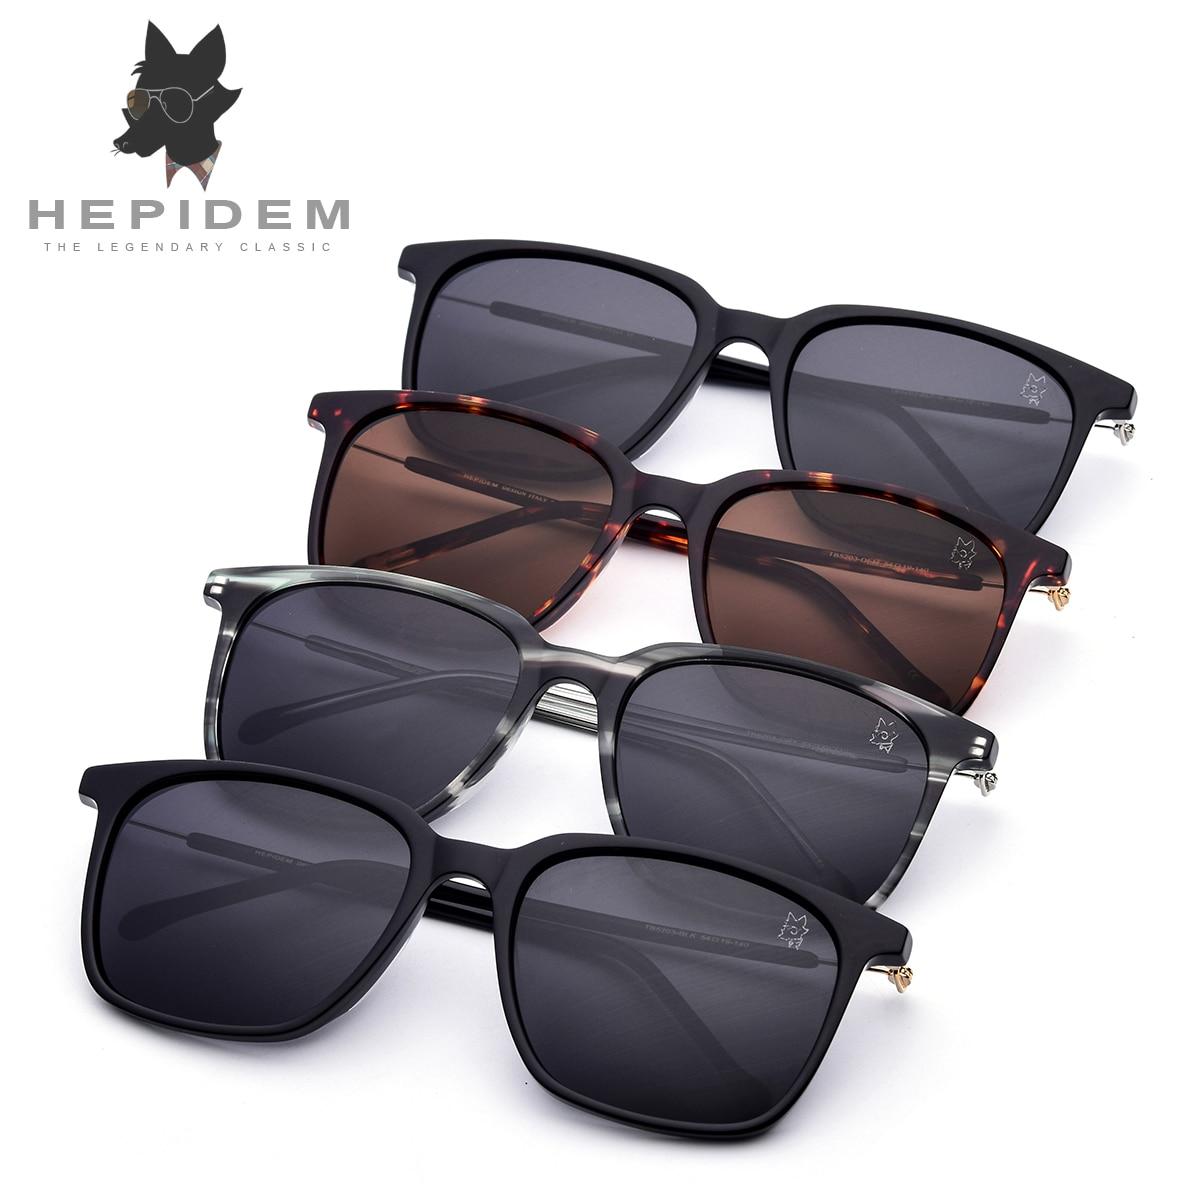 61b21ba24fe Acetate Sunglasses Men Polarized Brand Designer 2018 New Fashion d Squared  Mirror Korean Sun Glasses for Women Screwless Eyewear-in Sunglasses from  Apparel ...